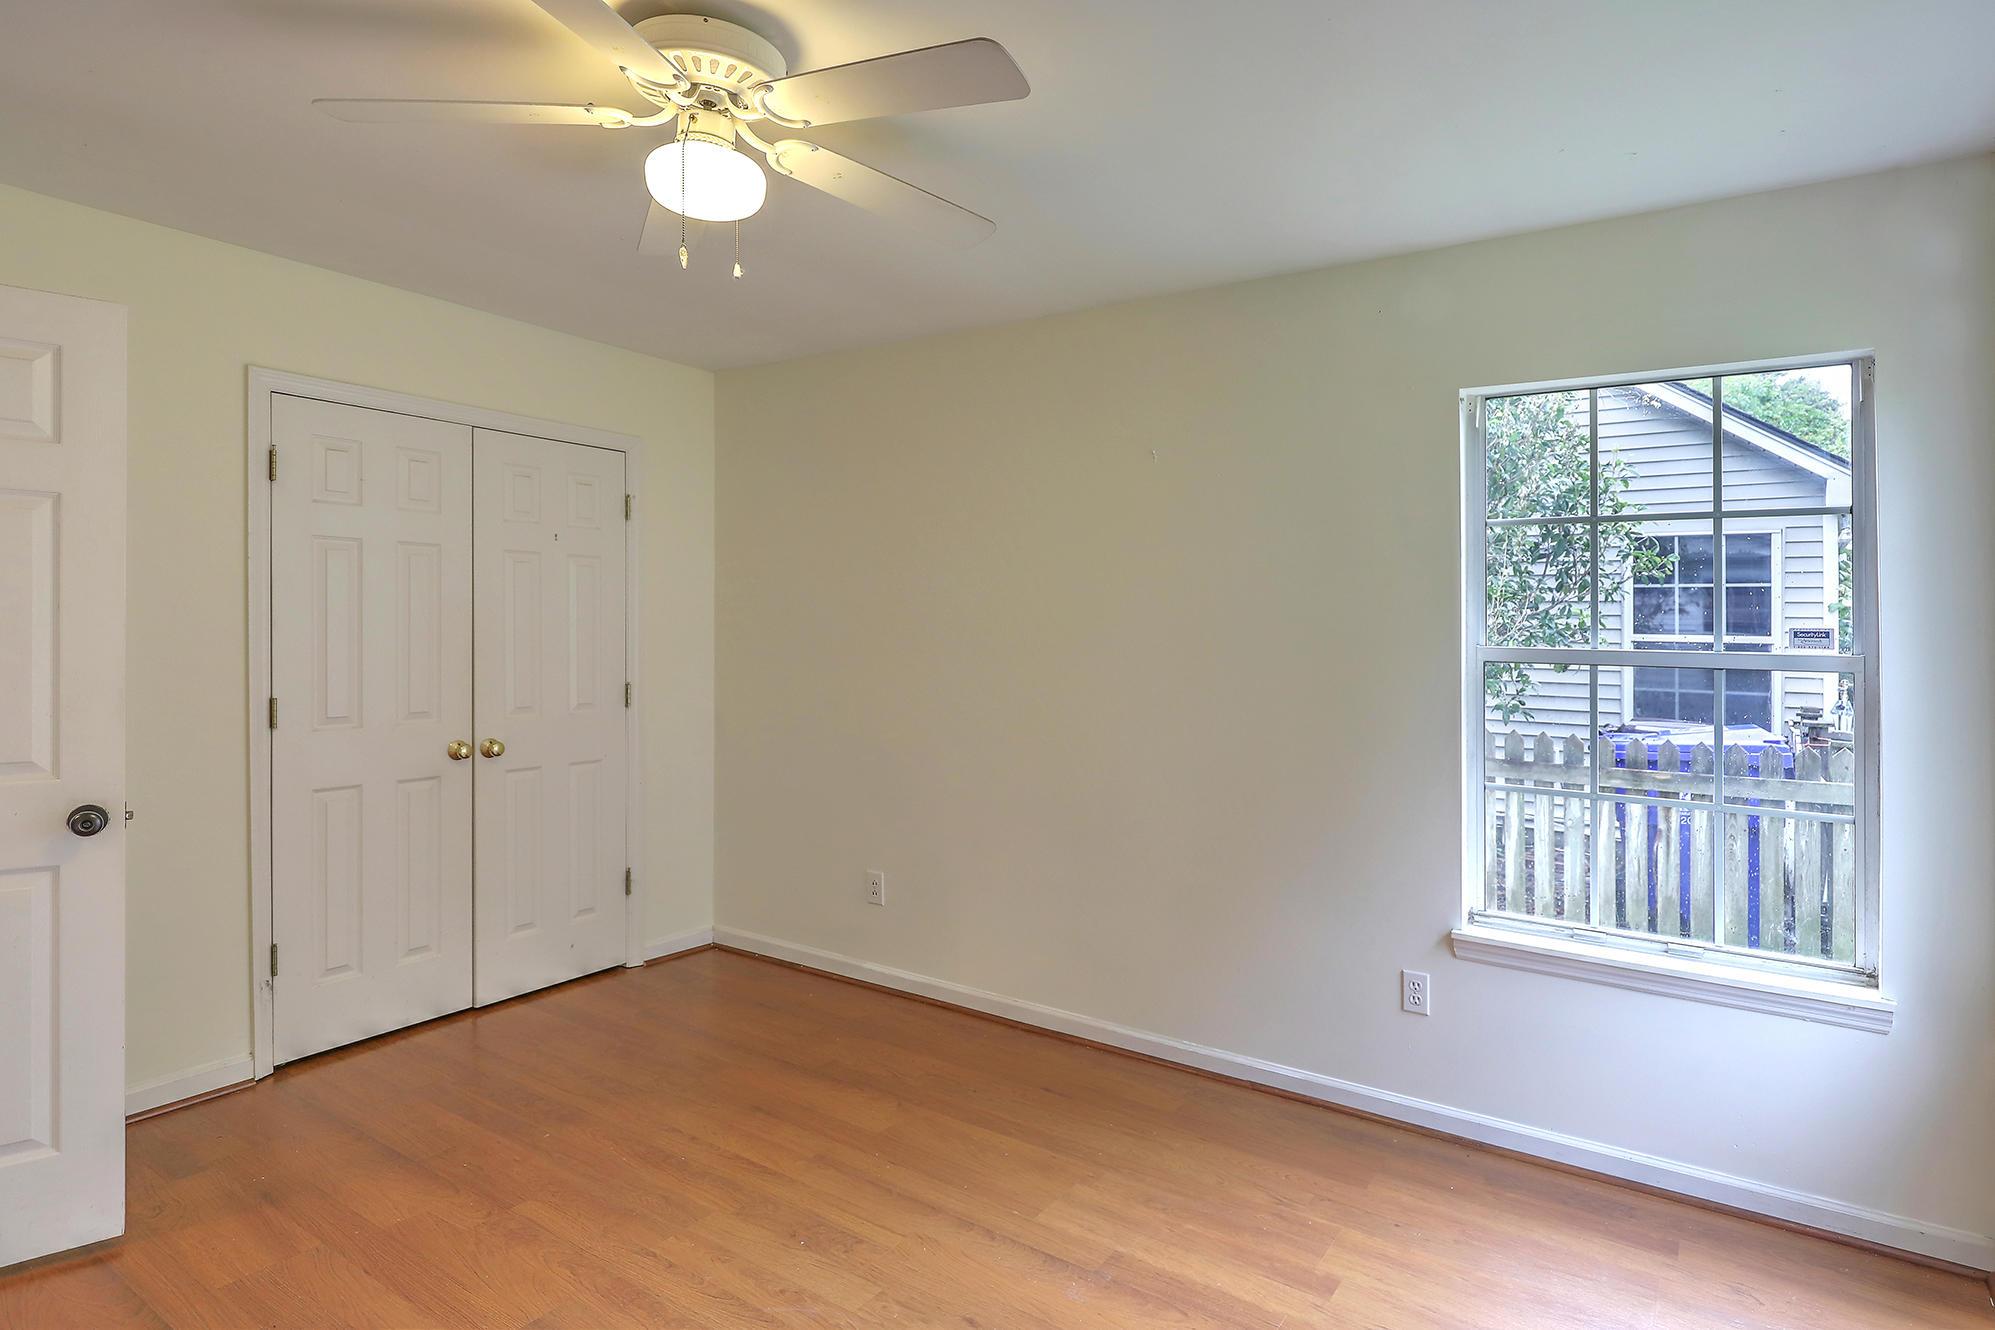 Planters Pointe Homes For Sale - 2951 Loebs, Mount Pleasant, SC - 29